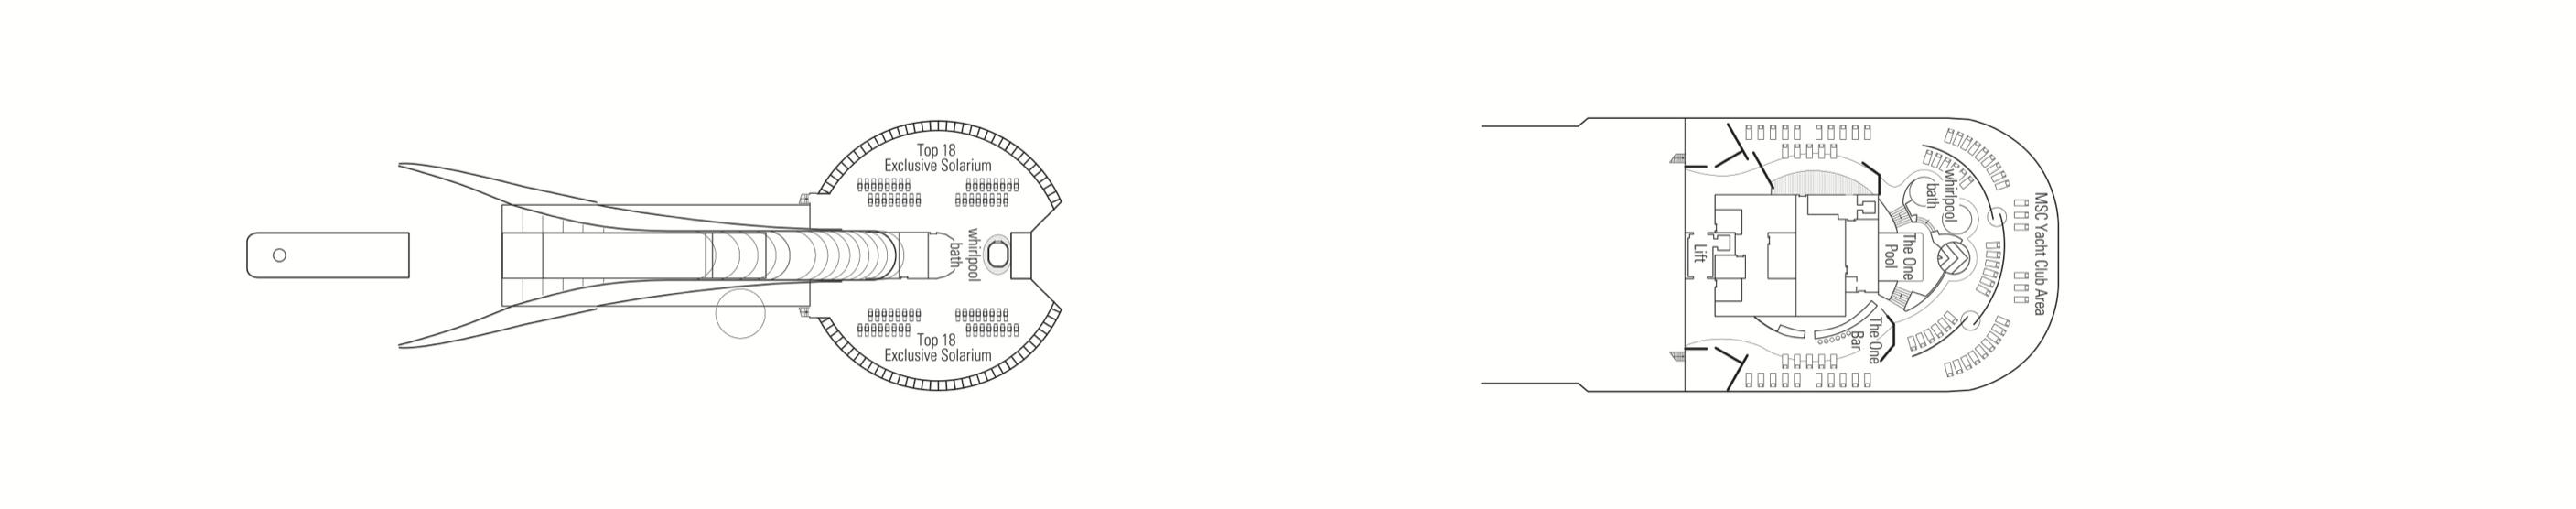 MSC Fantasia-deckplan-Deck 18 - Sun Deck